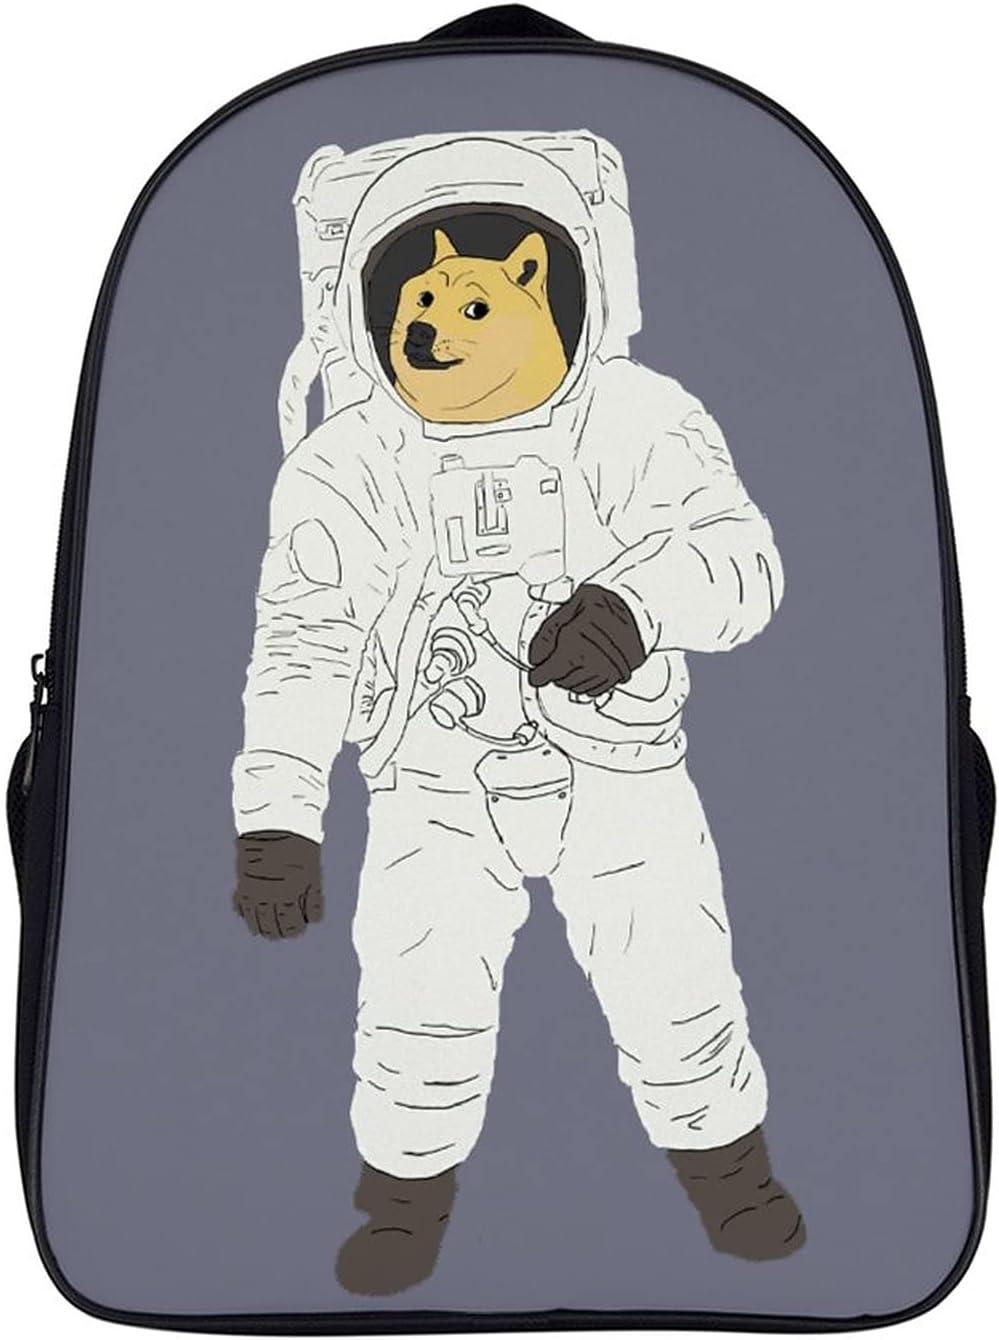 NASA Pattern Astronaut Doge Backpack Travel Work Bag School laptop Business Backpacks Women Men's Gift